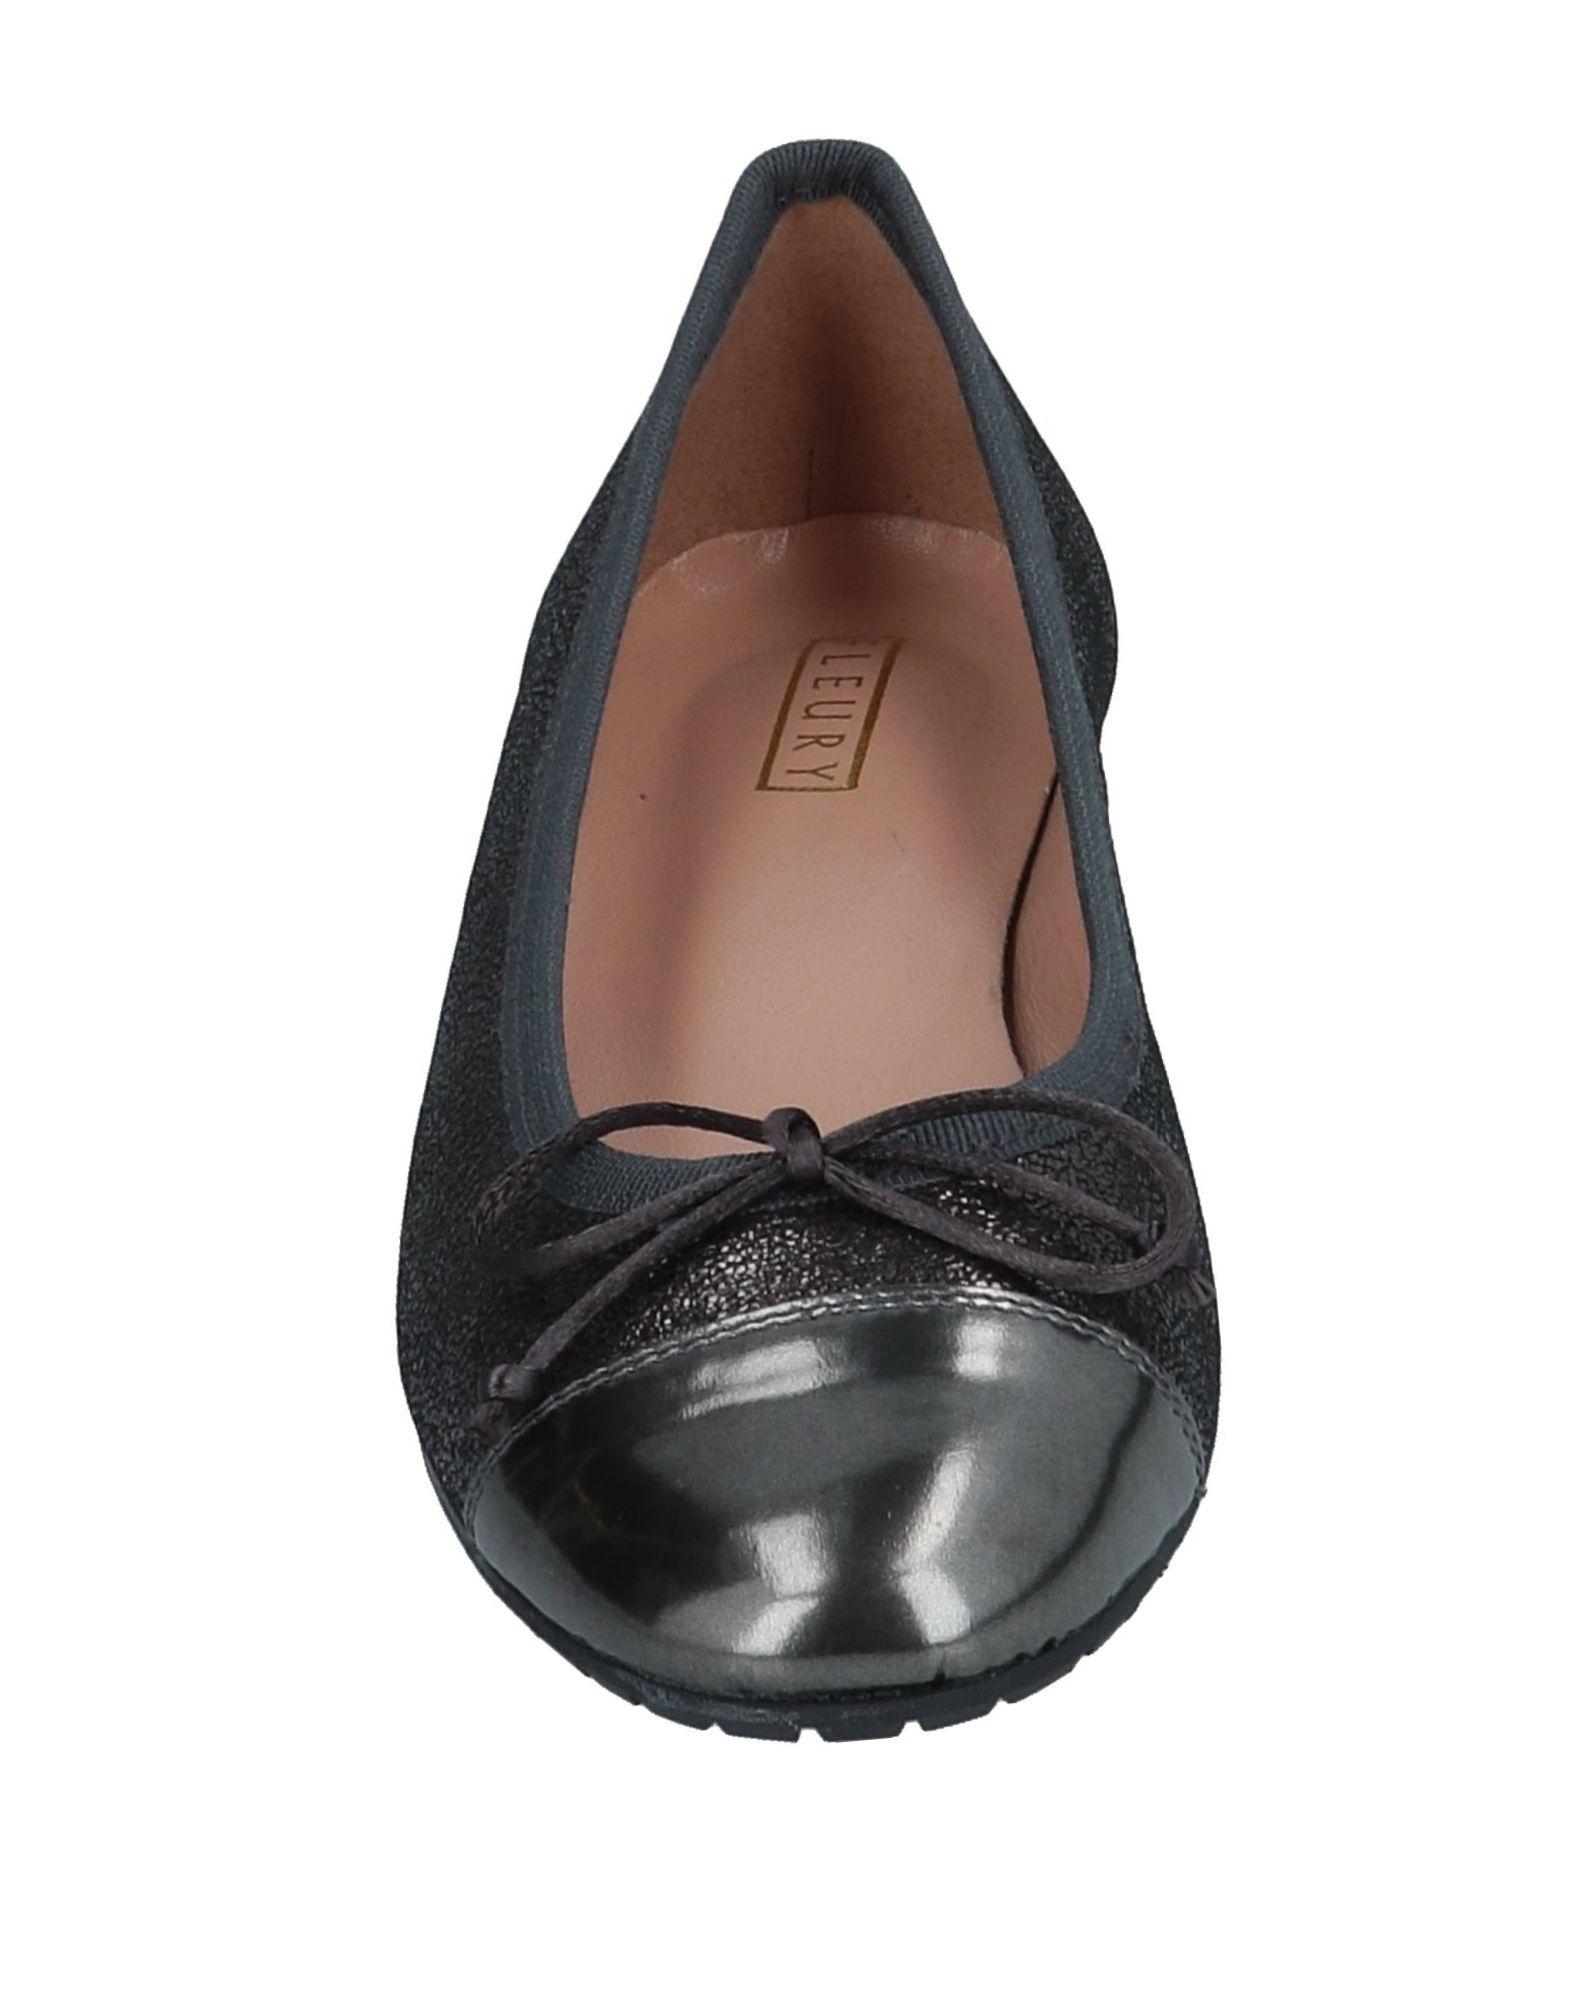 Fleury Ballerinas Damen Damen Ballerinas  11556511UJ  c1fa28